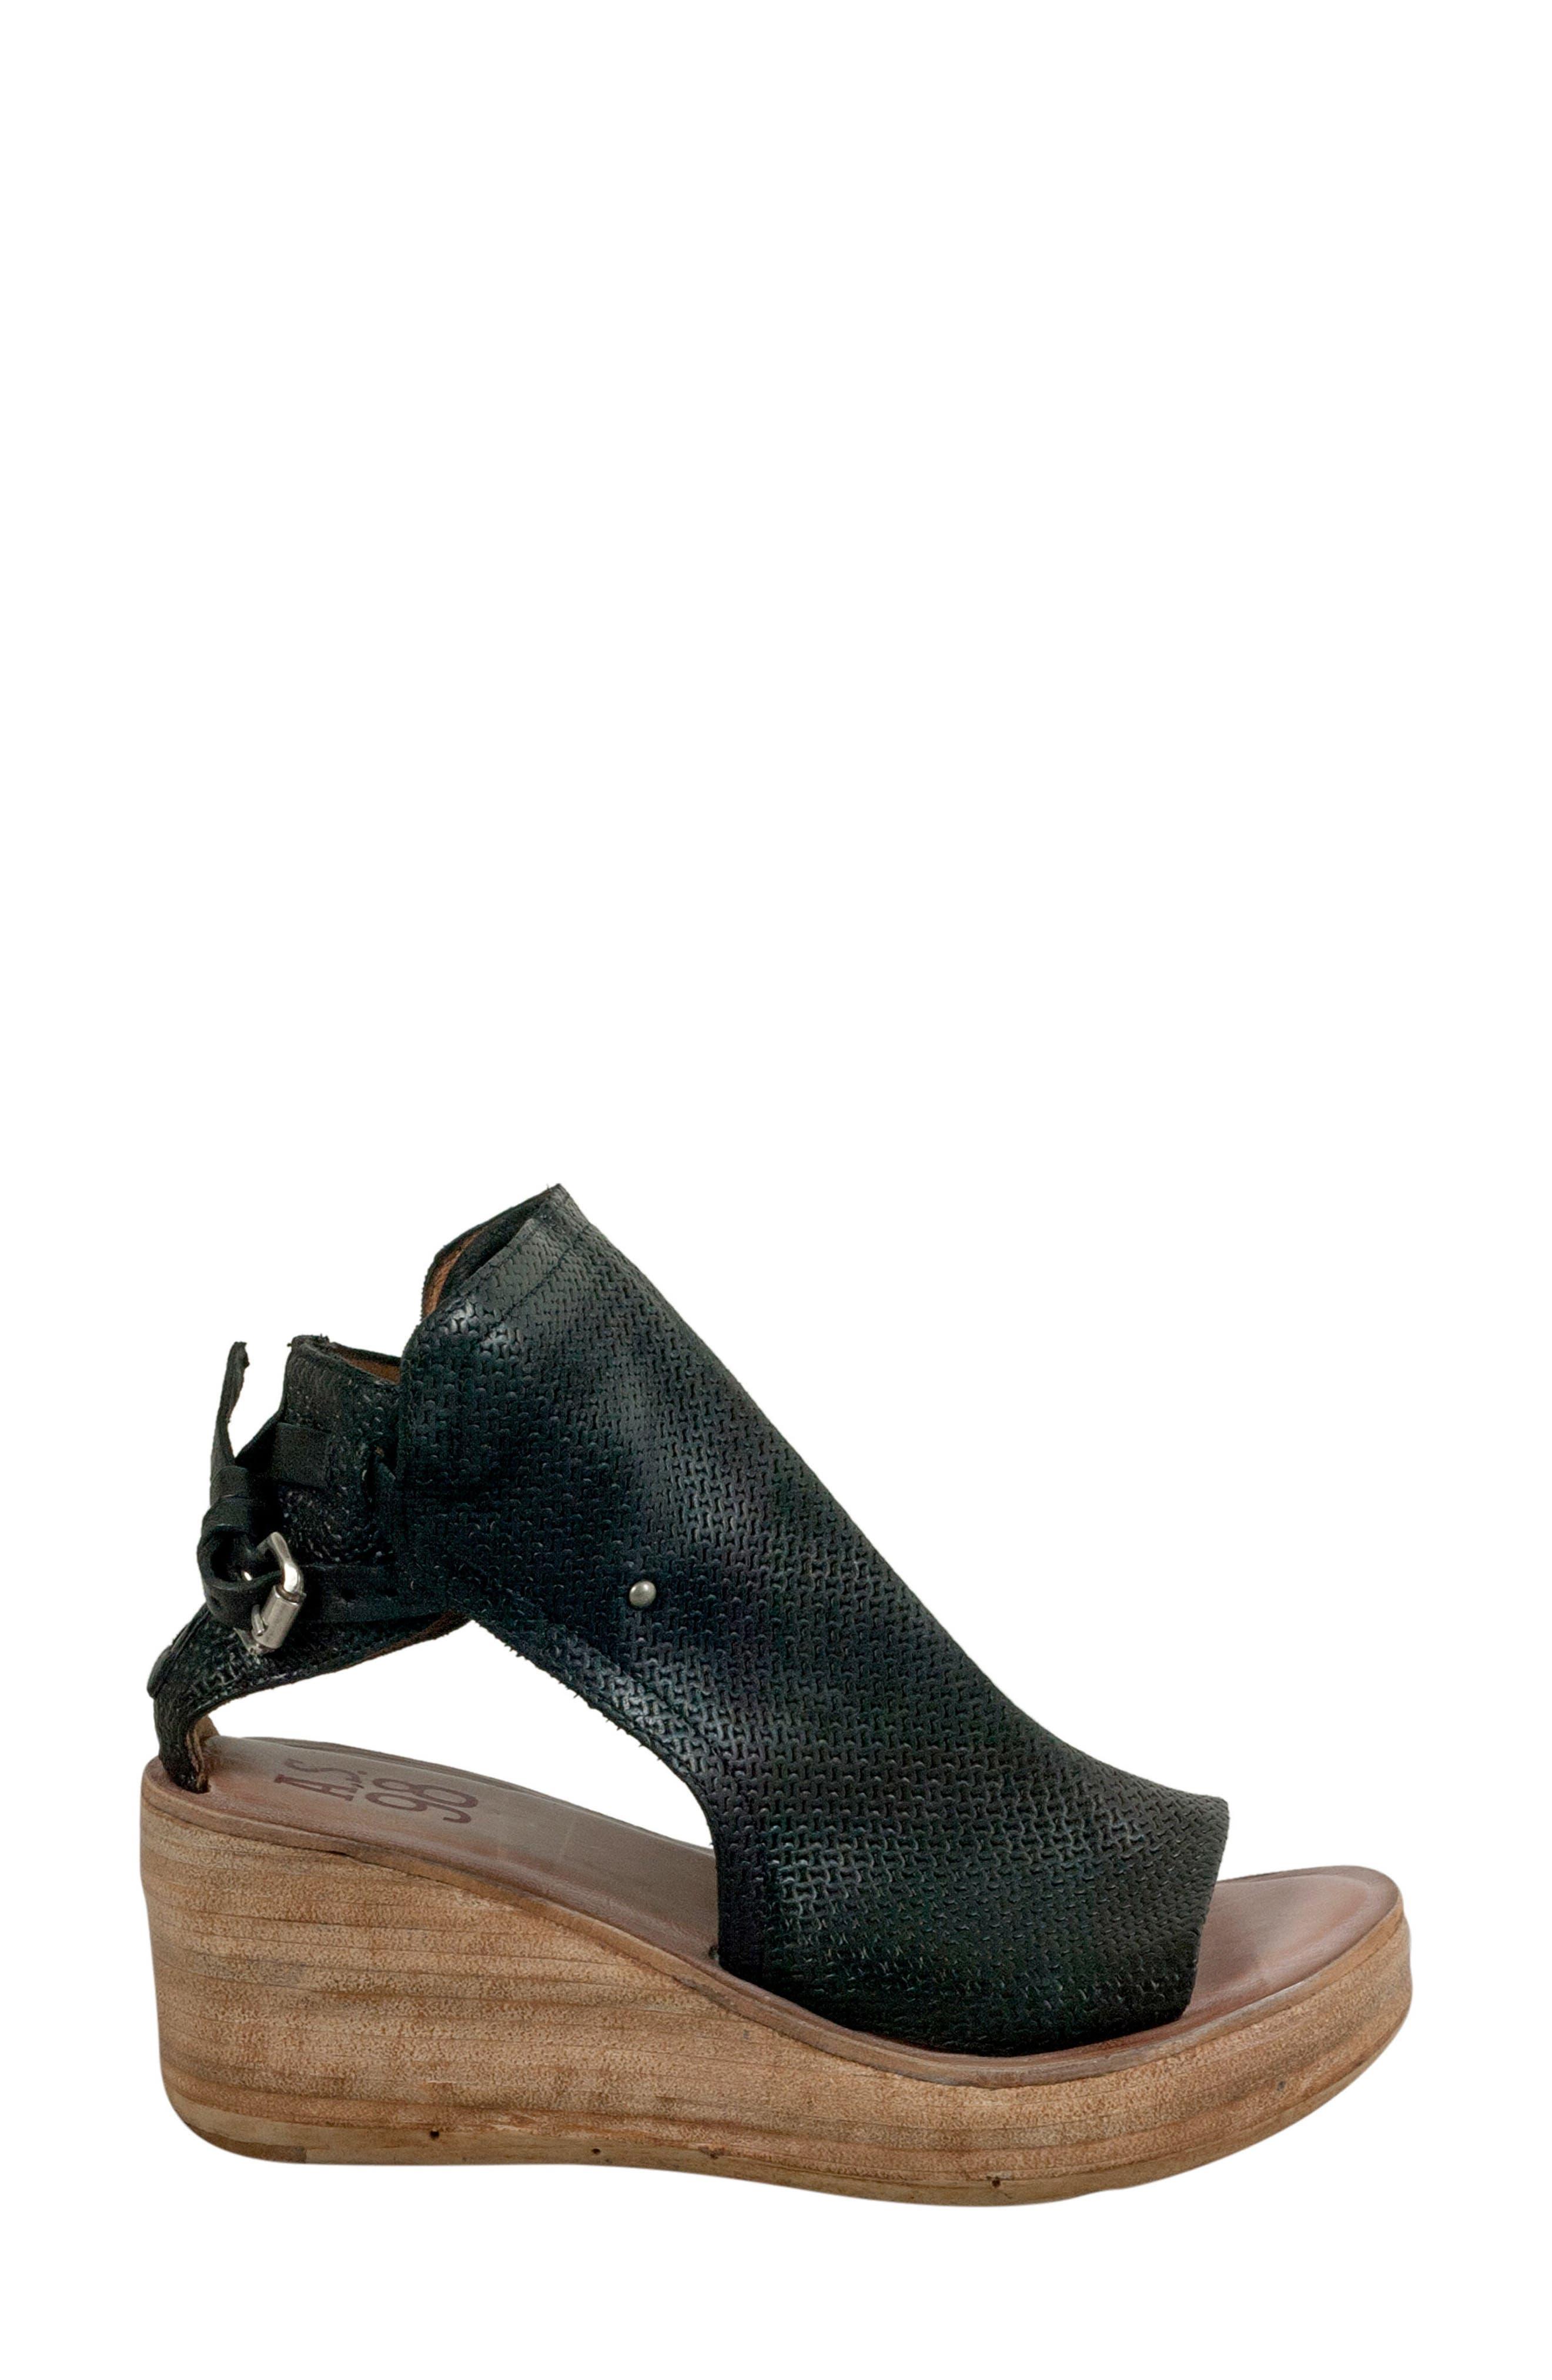 Nathan Platform Wedge Sandal,                             Alternate thumbnail 3, color,                             Black